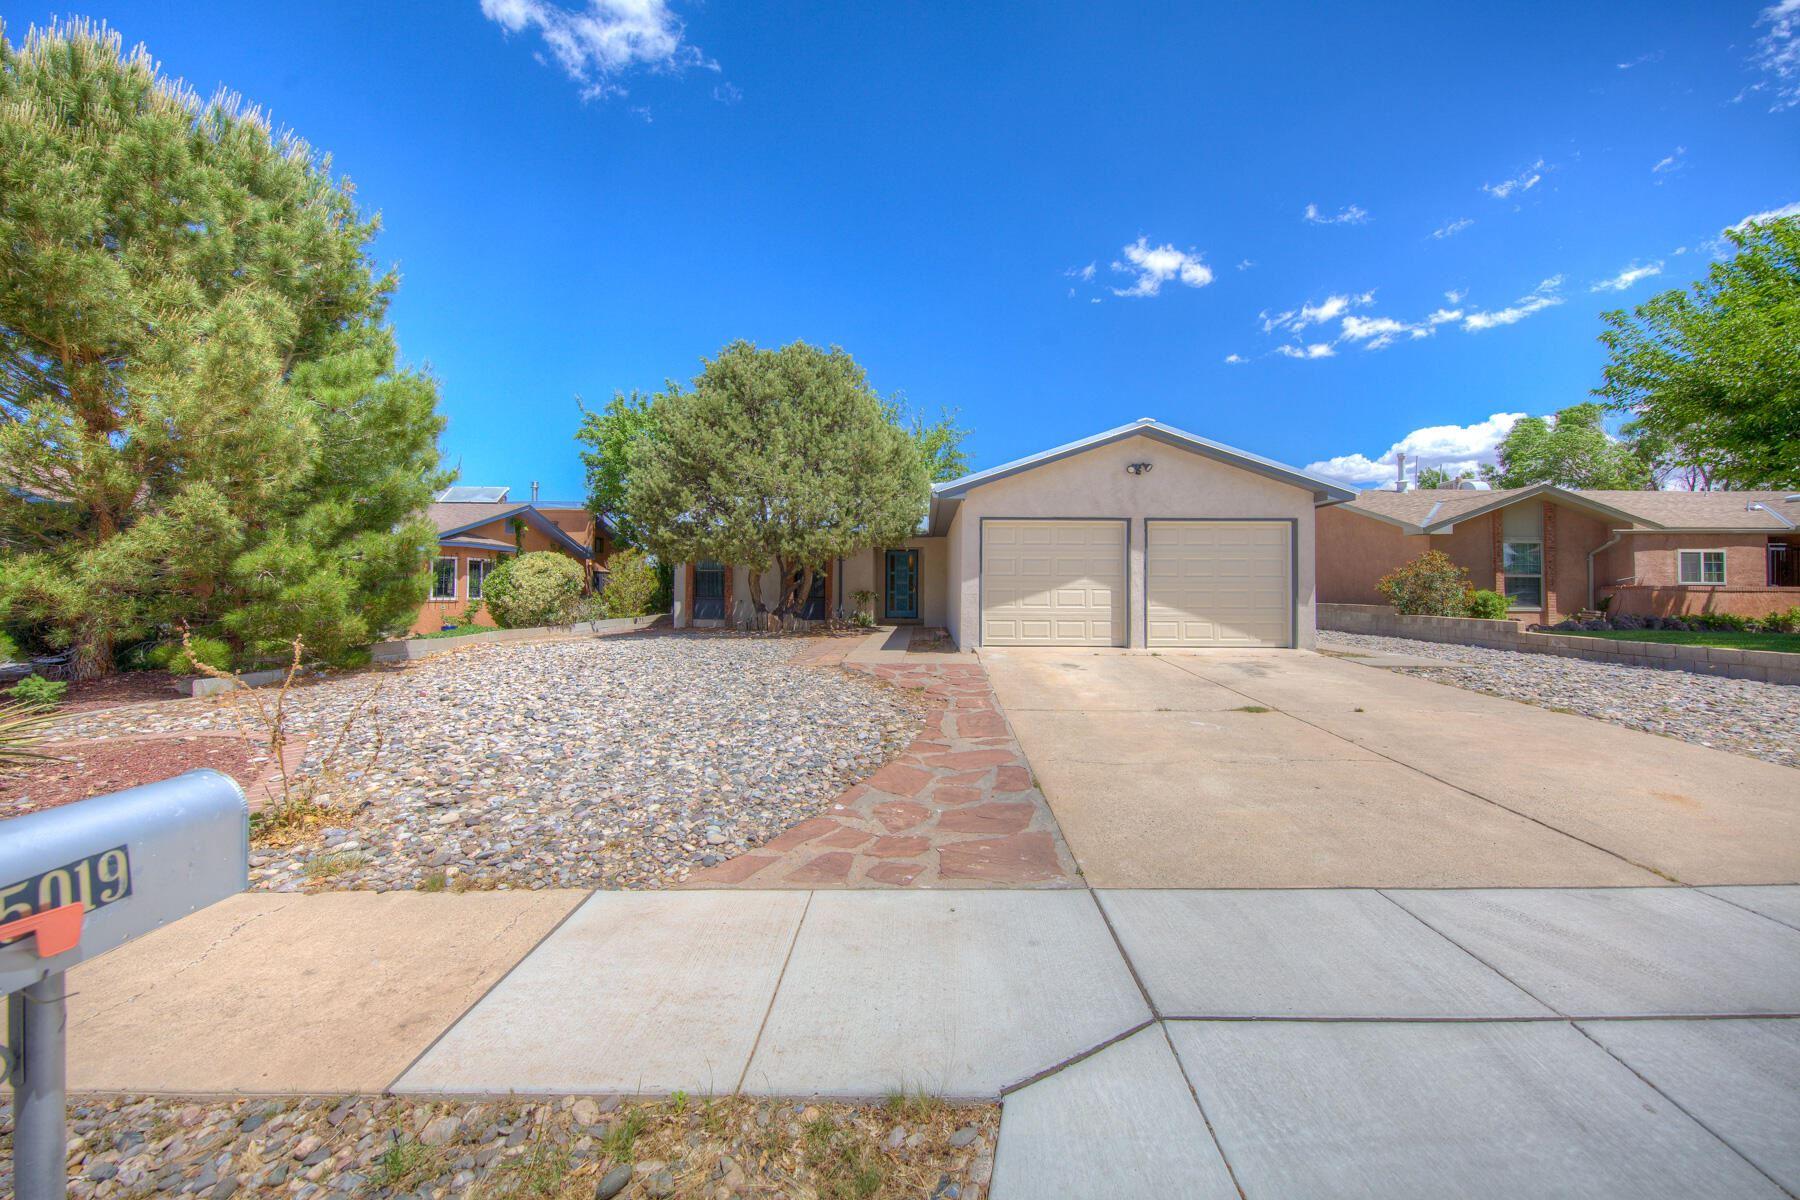 Photo of 5019 WATERCRESS Drive NE, Albuquerque, NM 87113 (MLS # 992736)